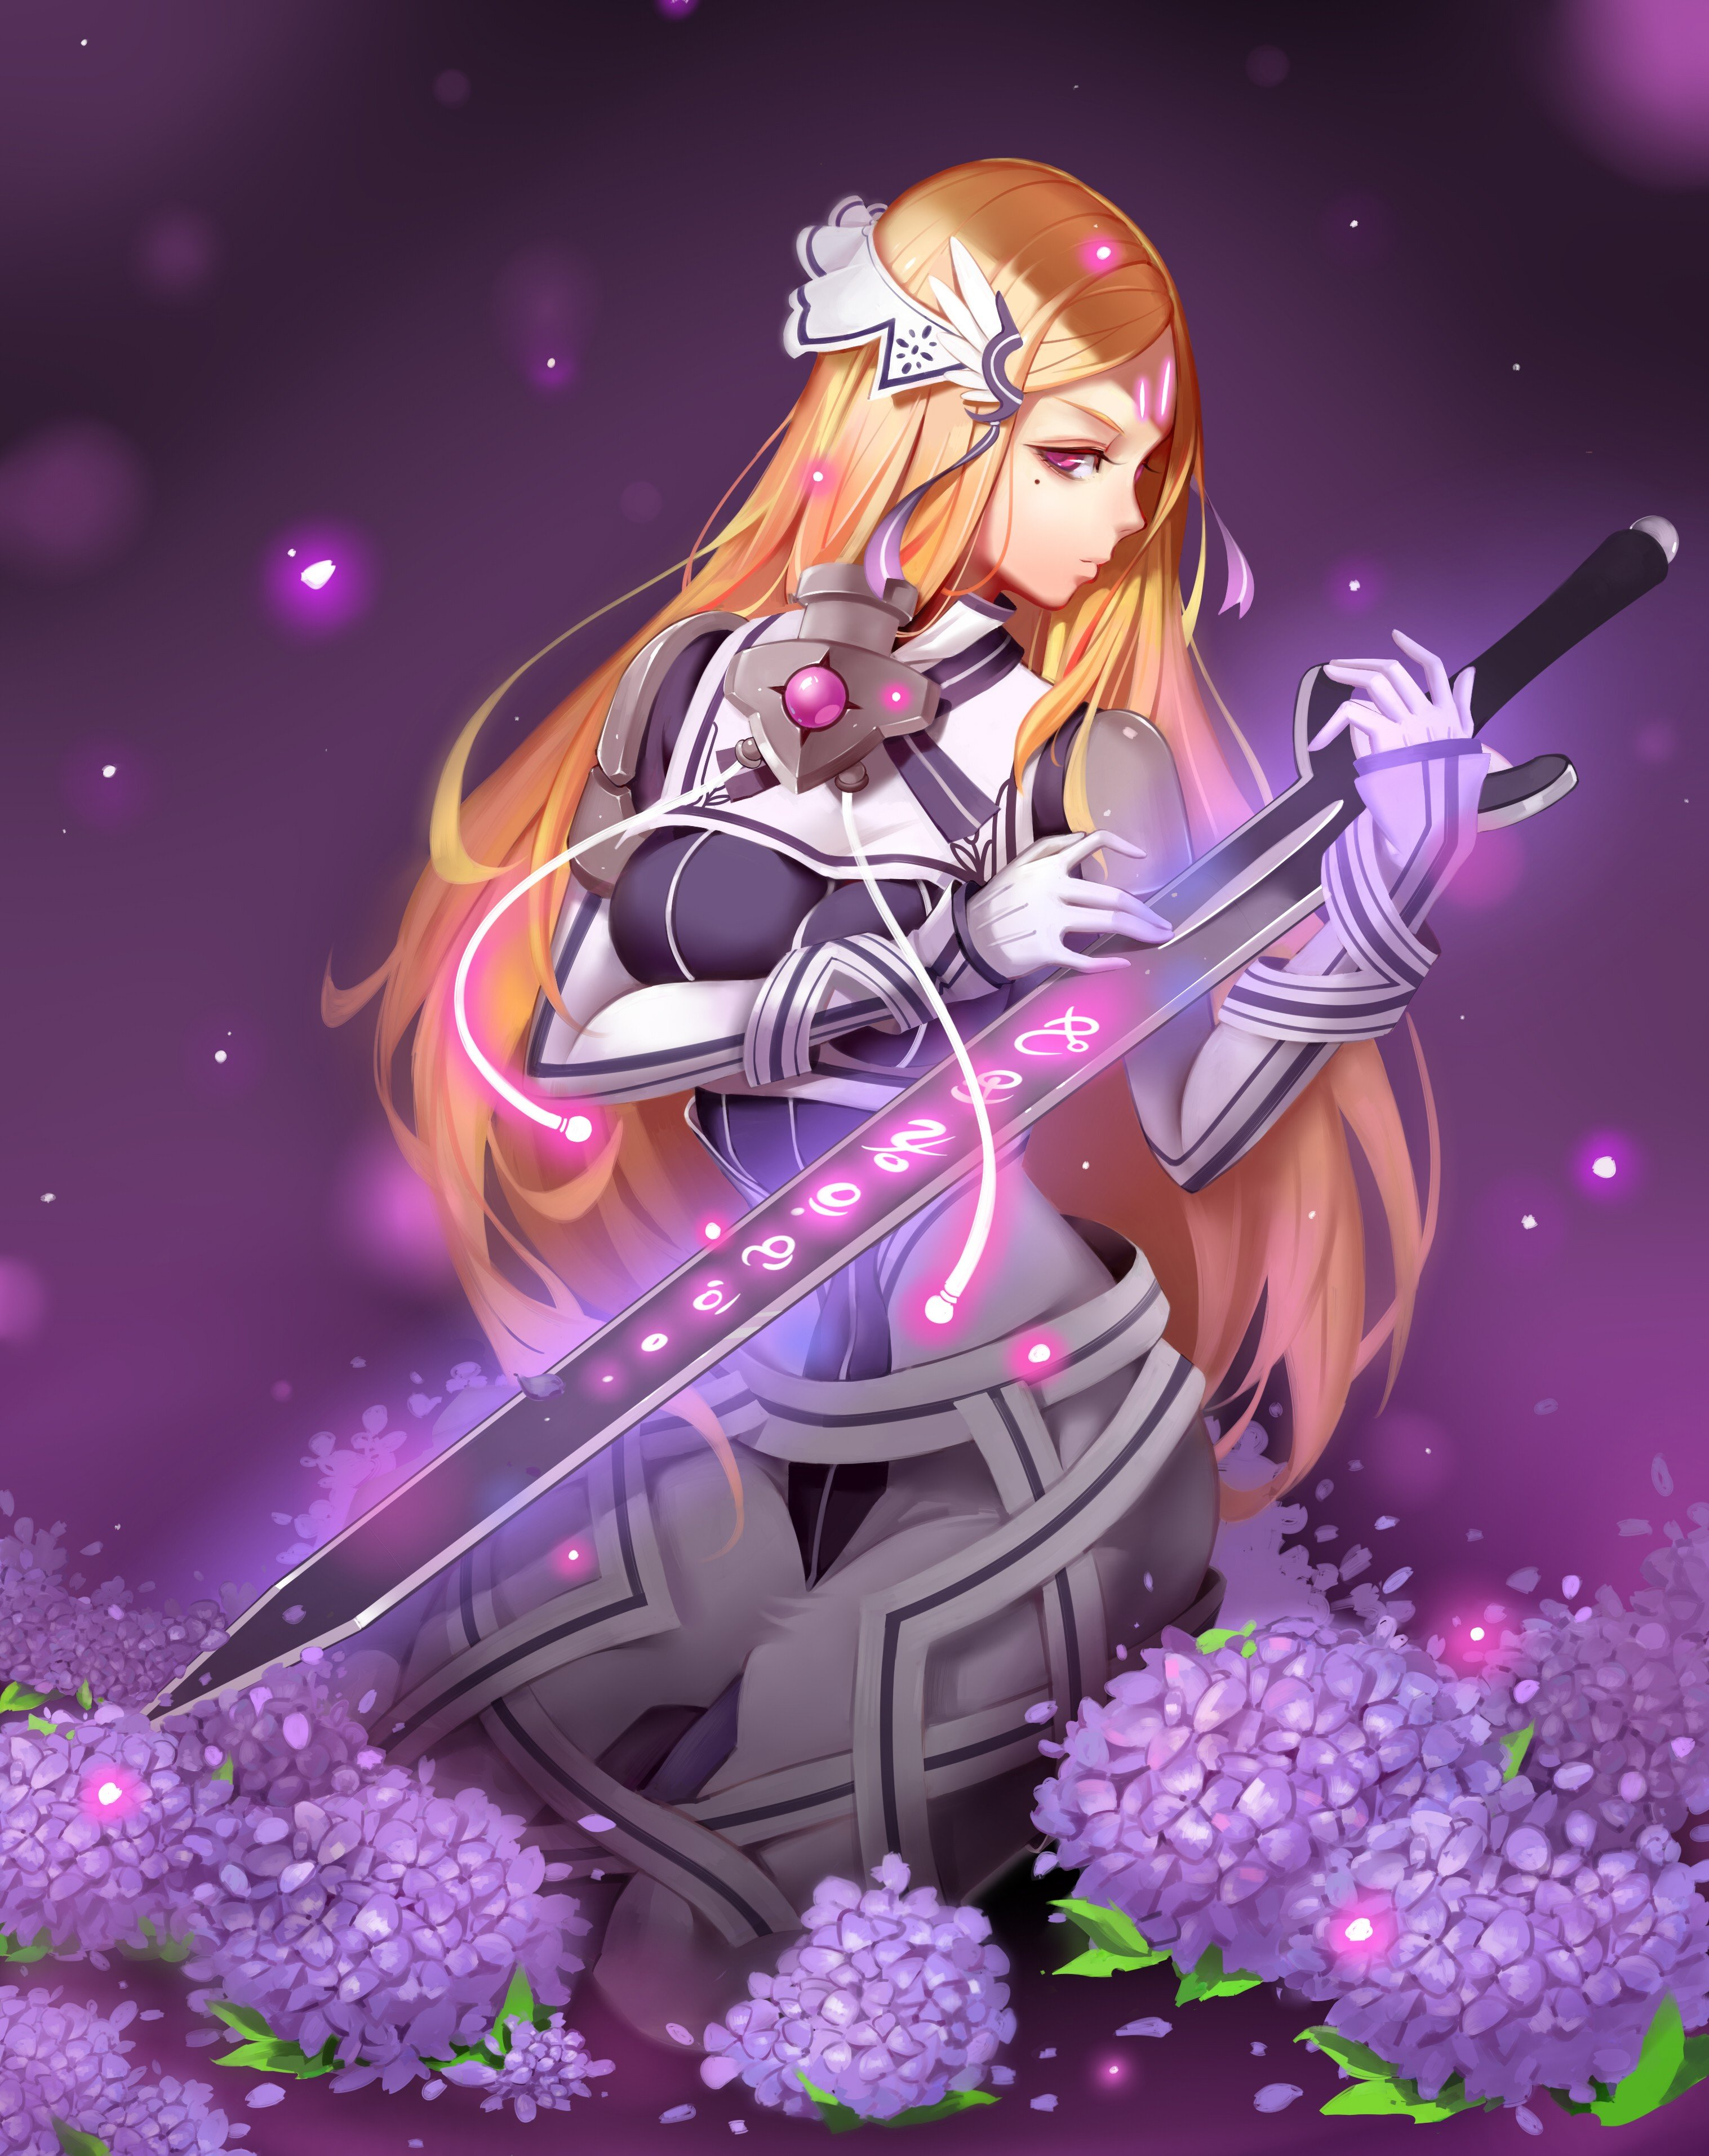 Long hair blonde red eyes anime anime girls sword - Anime girl with weapon ...